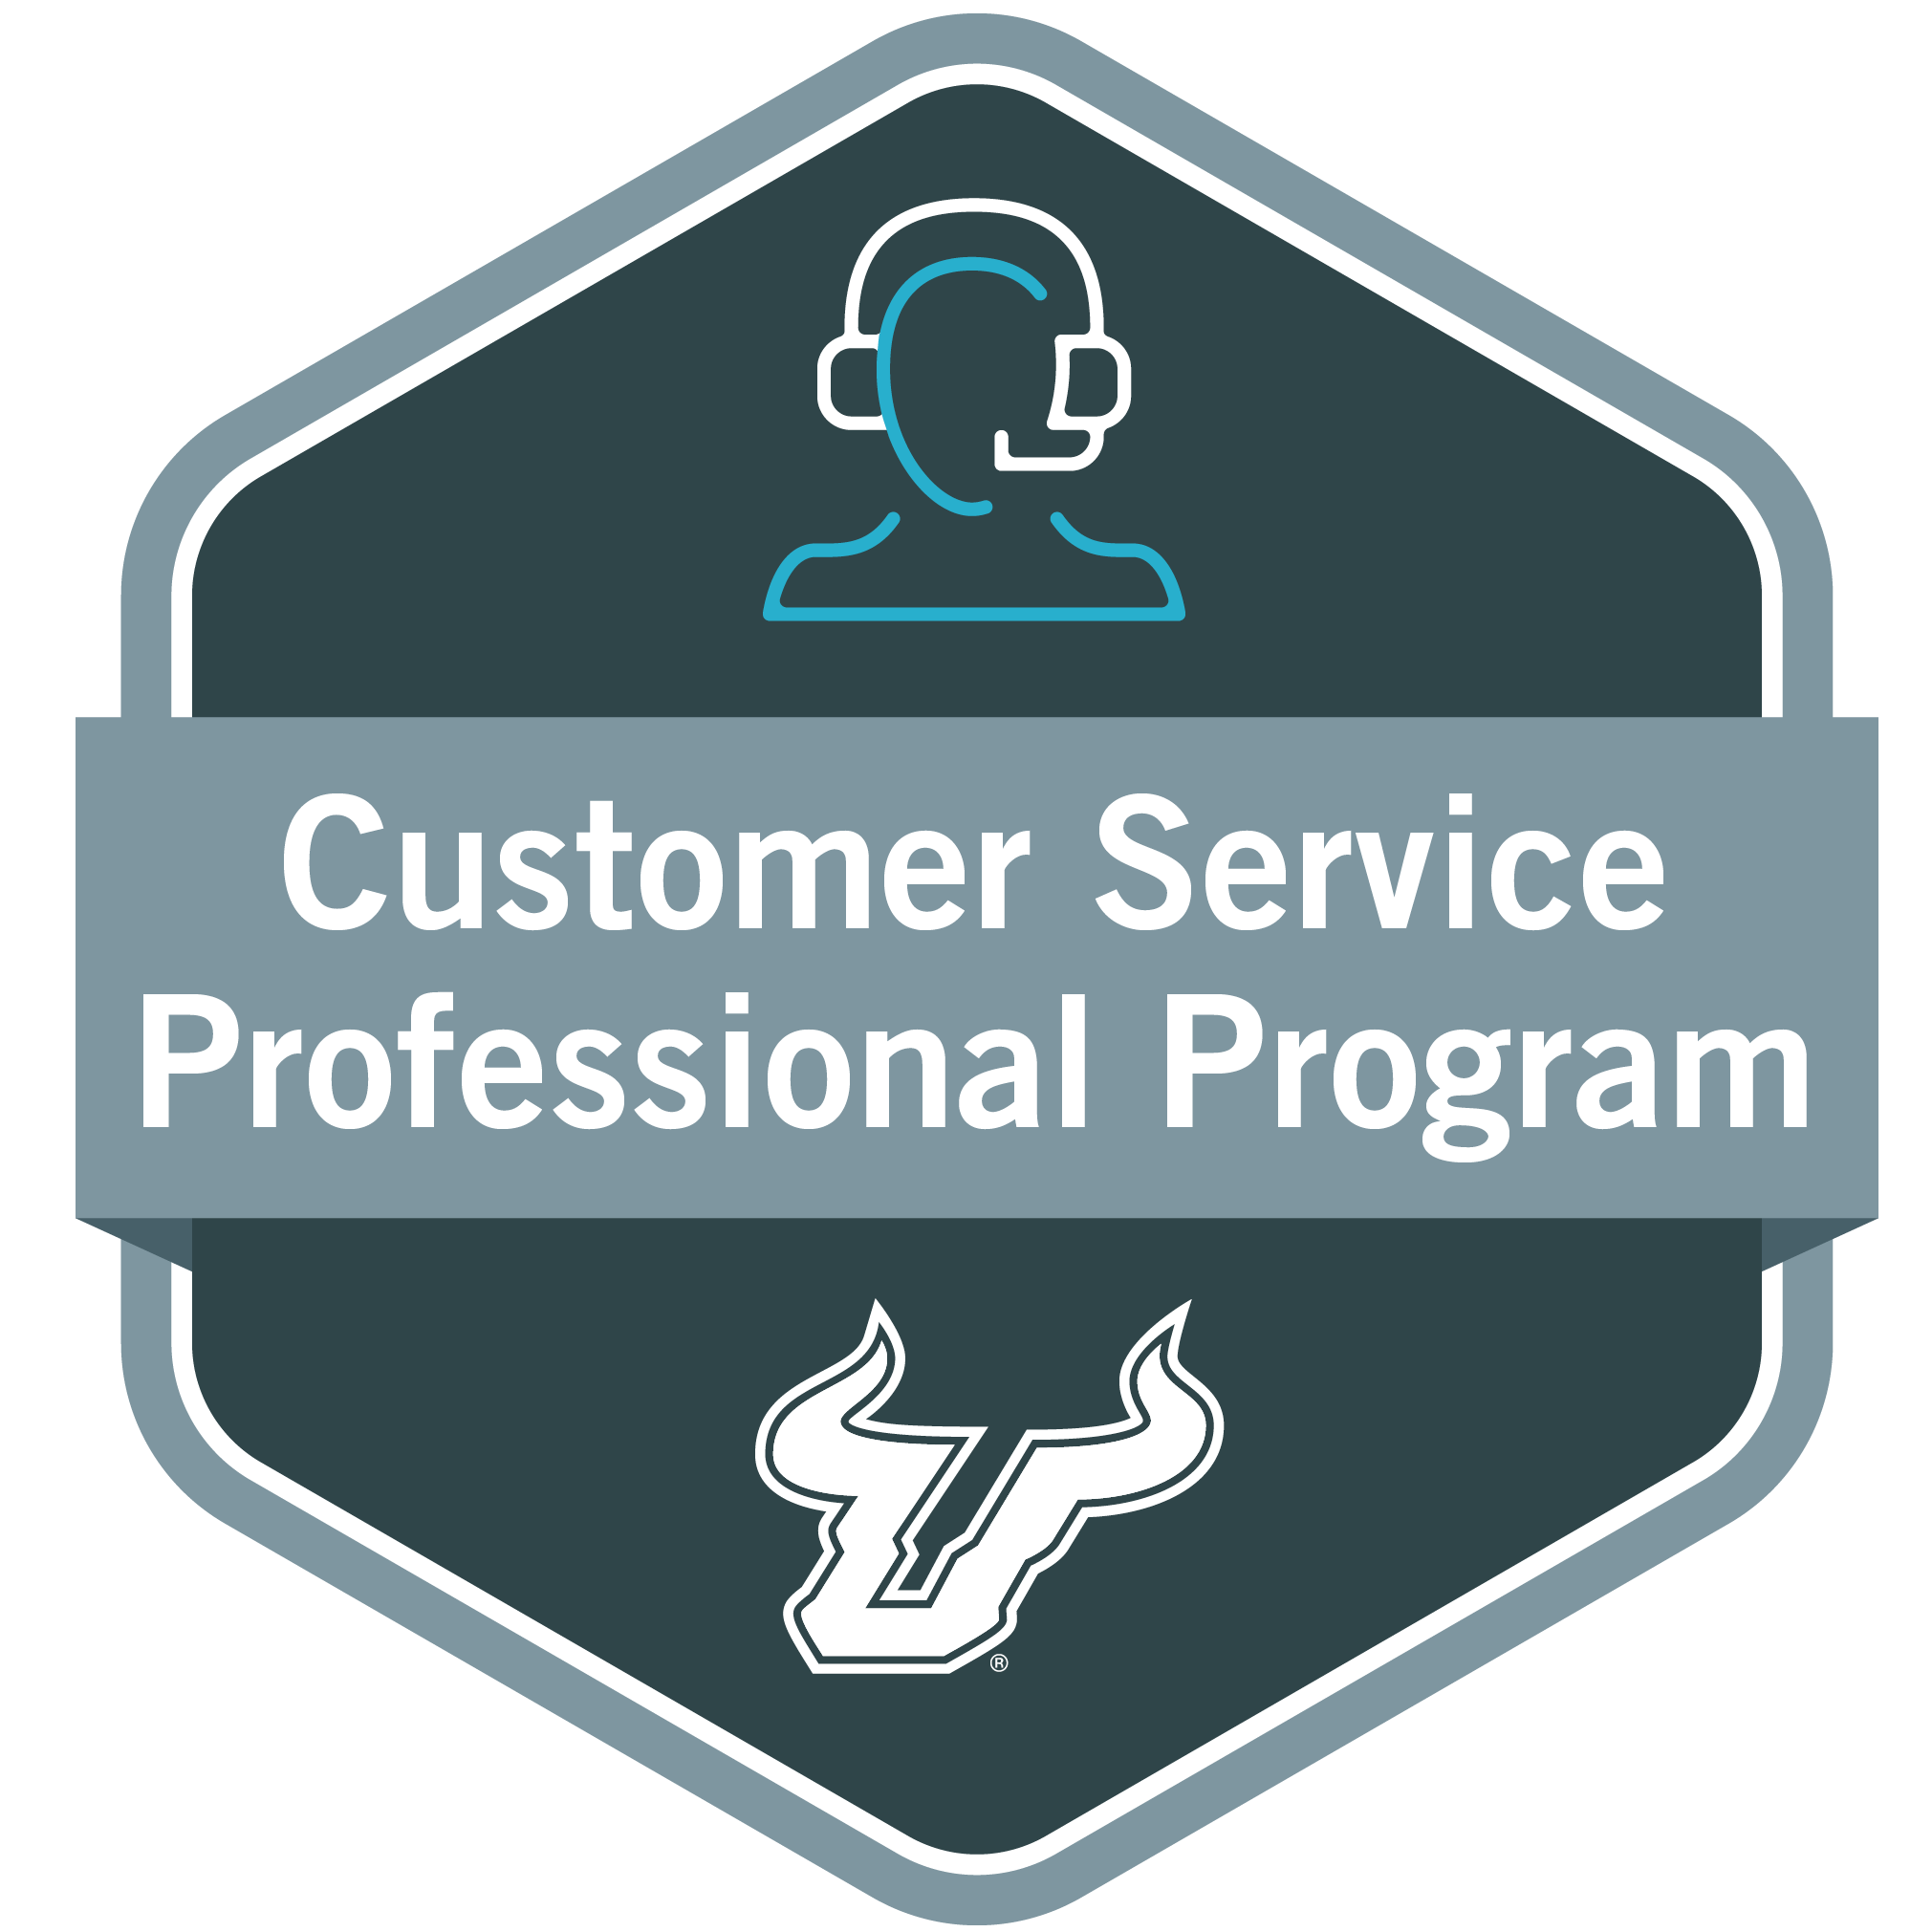 Customer Service Professional Program Stack-A-Bull